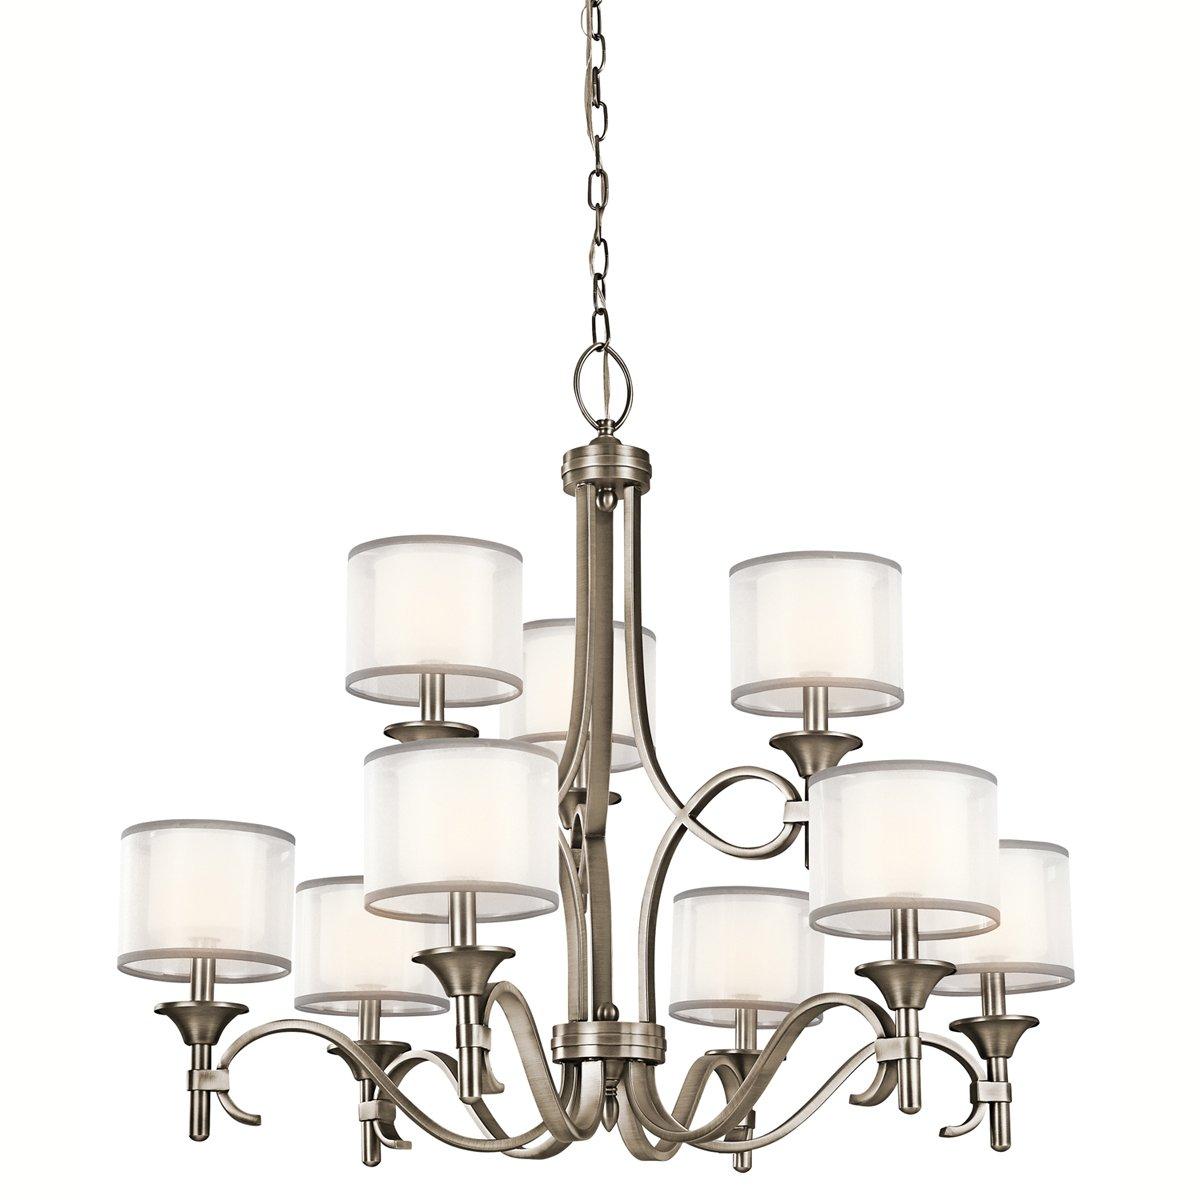 Kichler 42382ap nine light chandelier amazon arubaitofo Choice Image